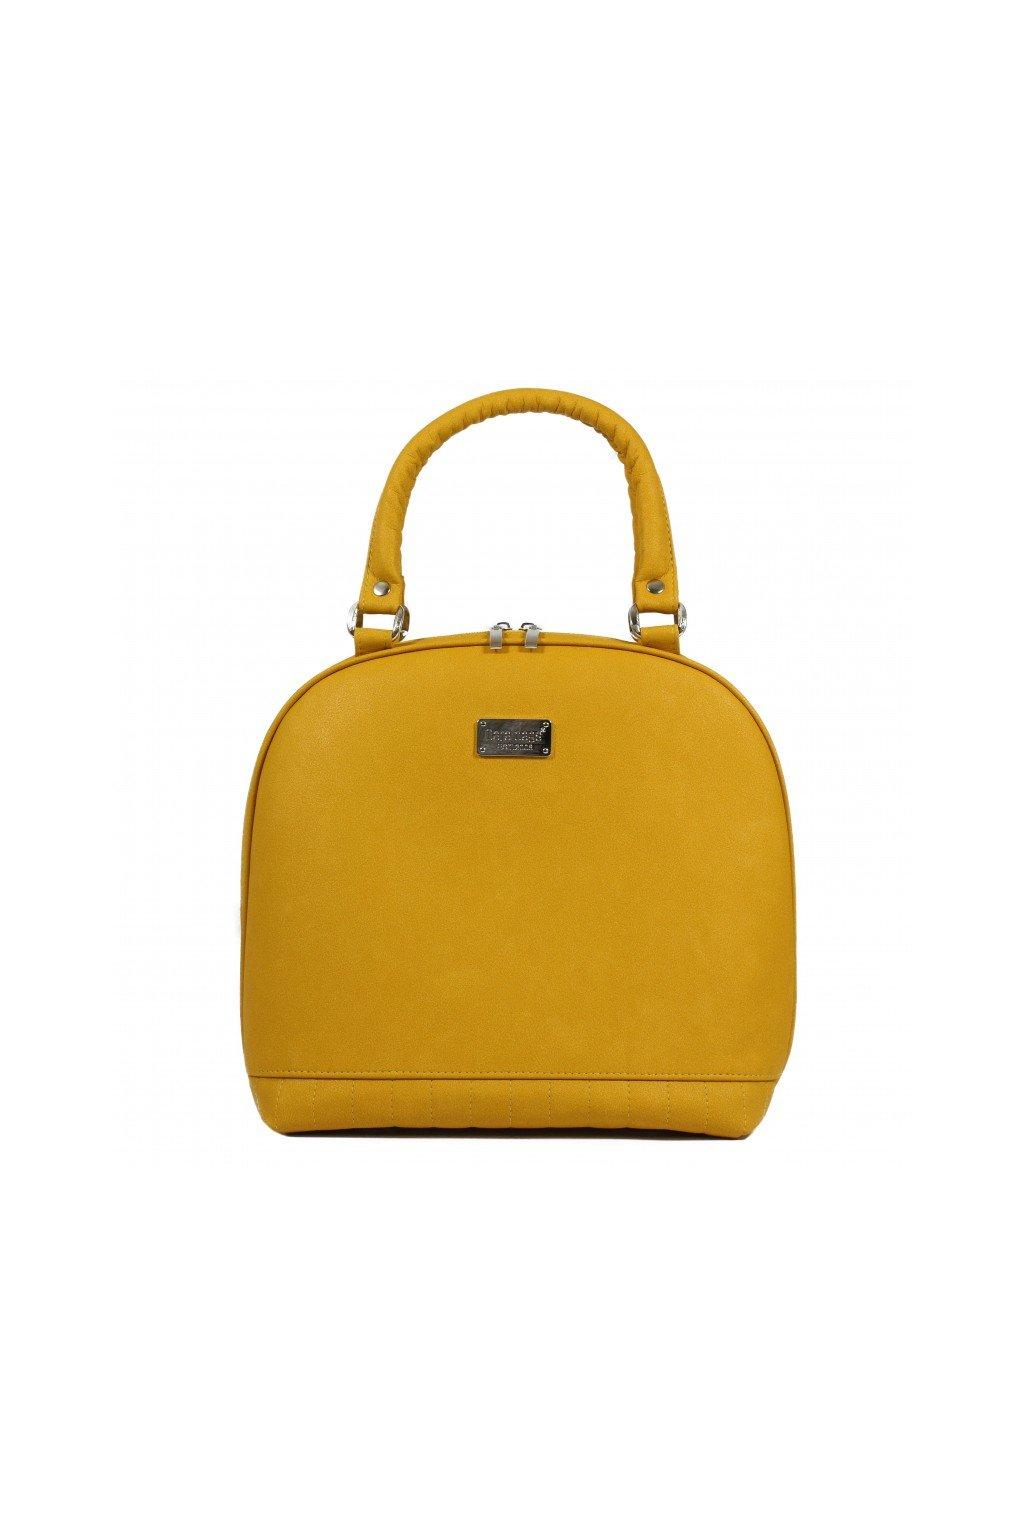 Krasna kabelka Bell Big Dara bags zluta 1